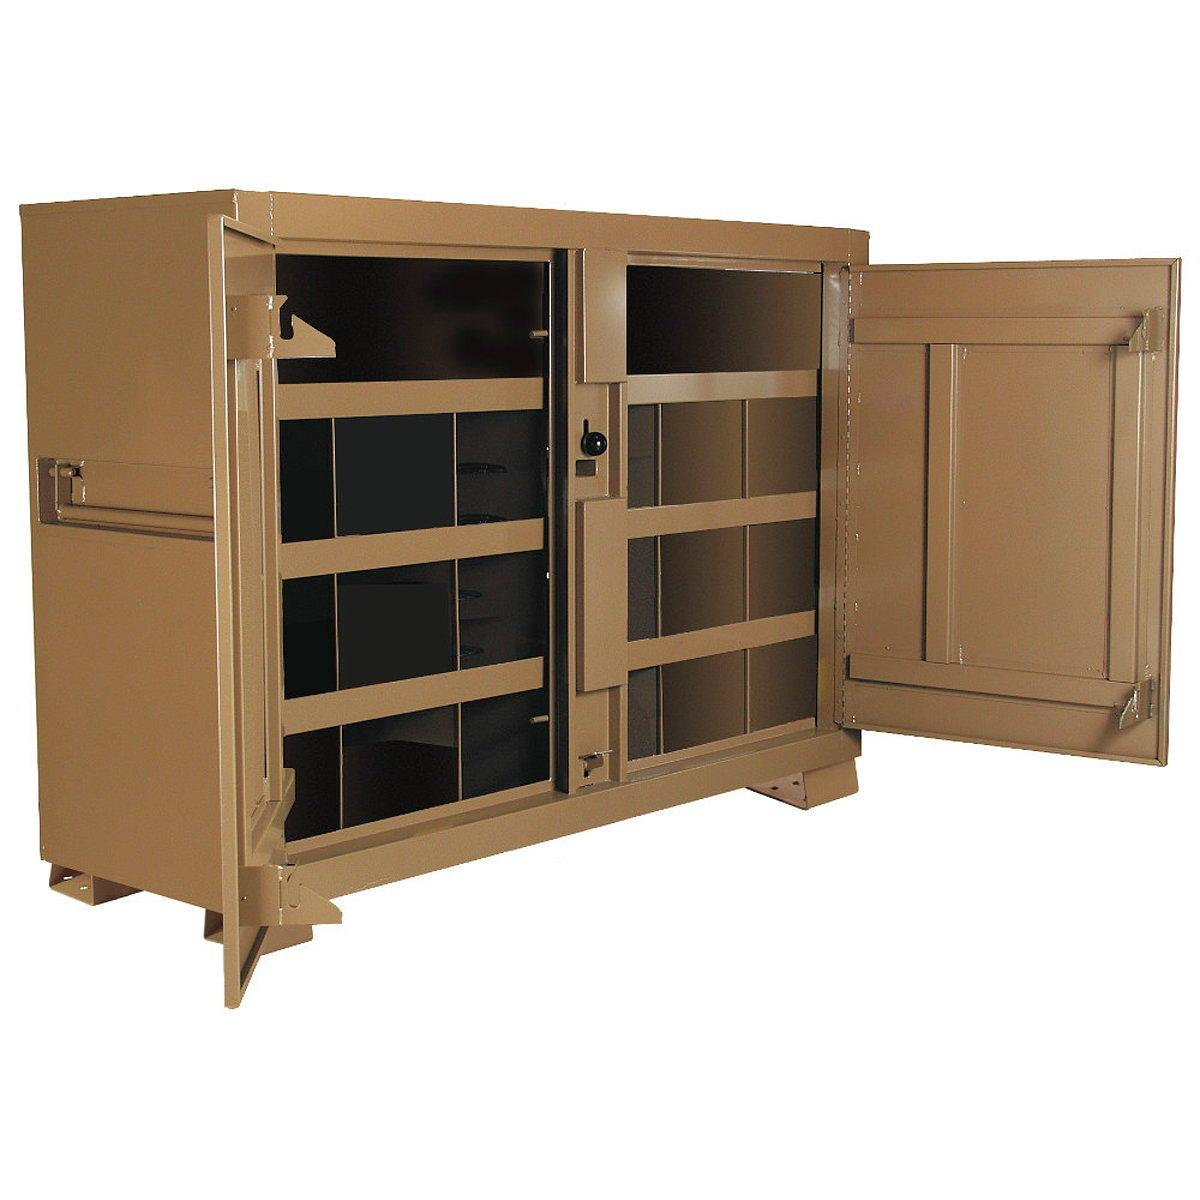 Amazon.com: Knaack 129 Jobsite Bin Storage Cabinet, 48 cu. ft ...